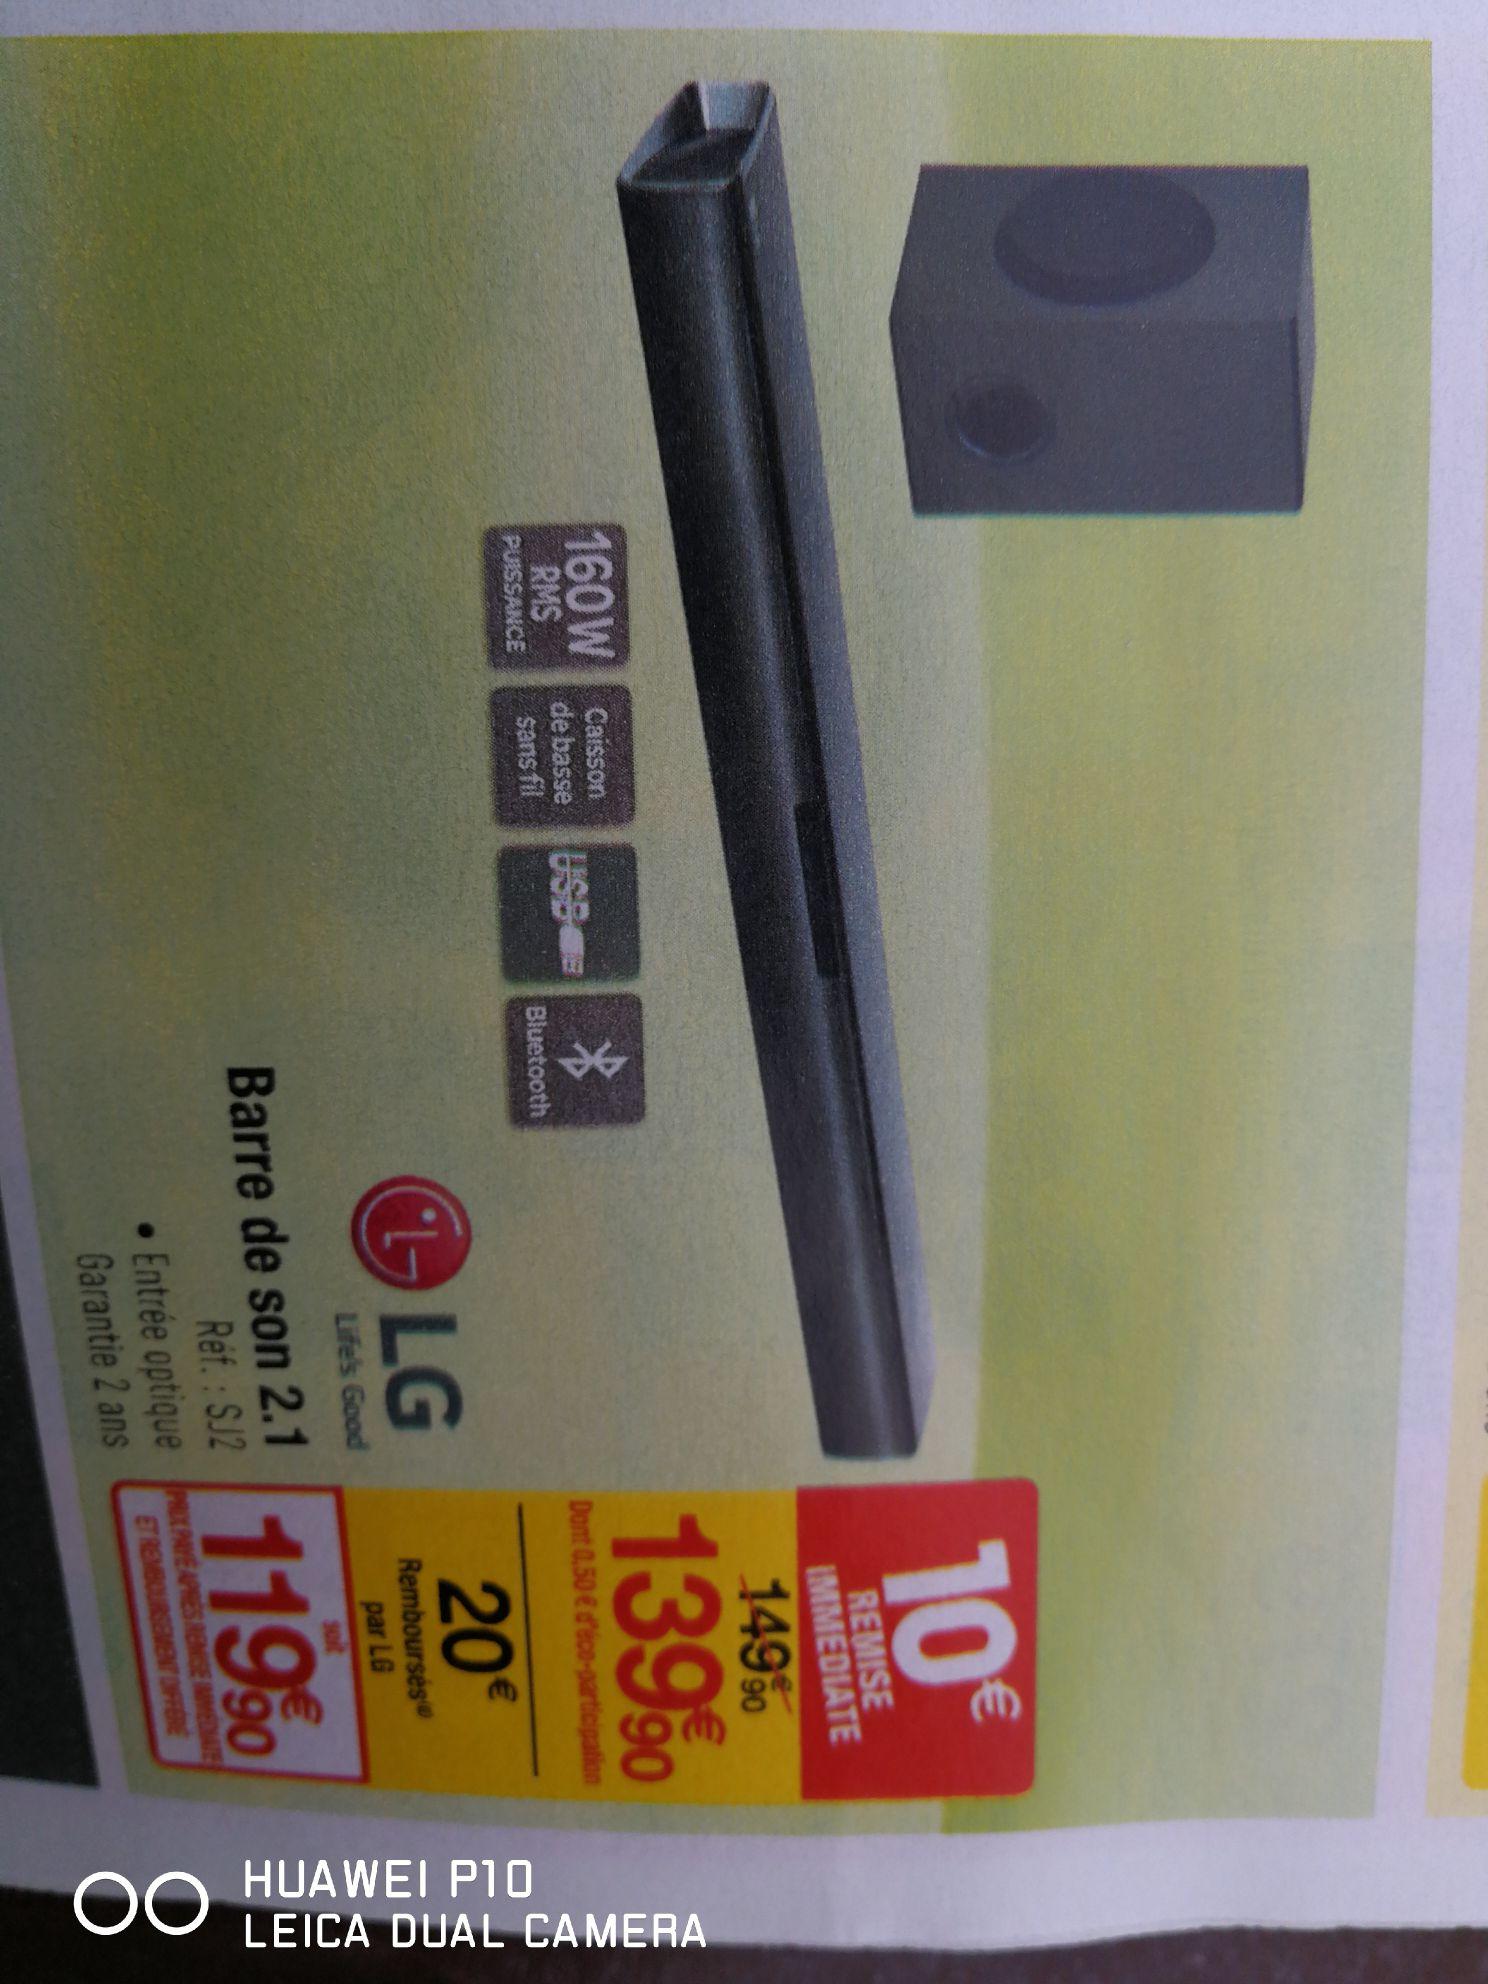 Barre de son LG SJ2 - 2.1 (via ODR 20€)